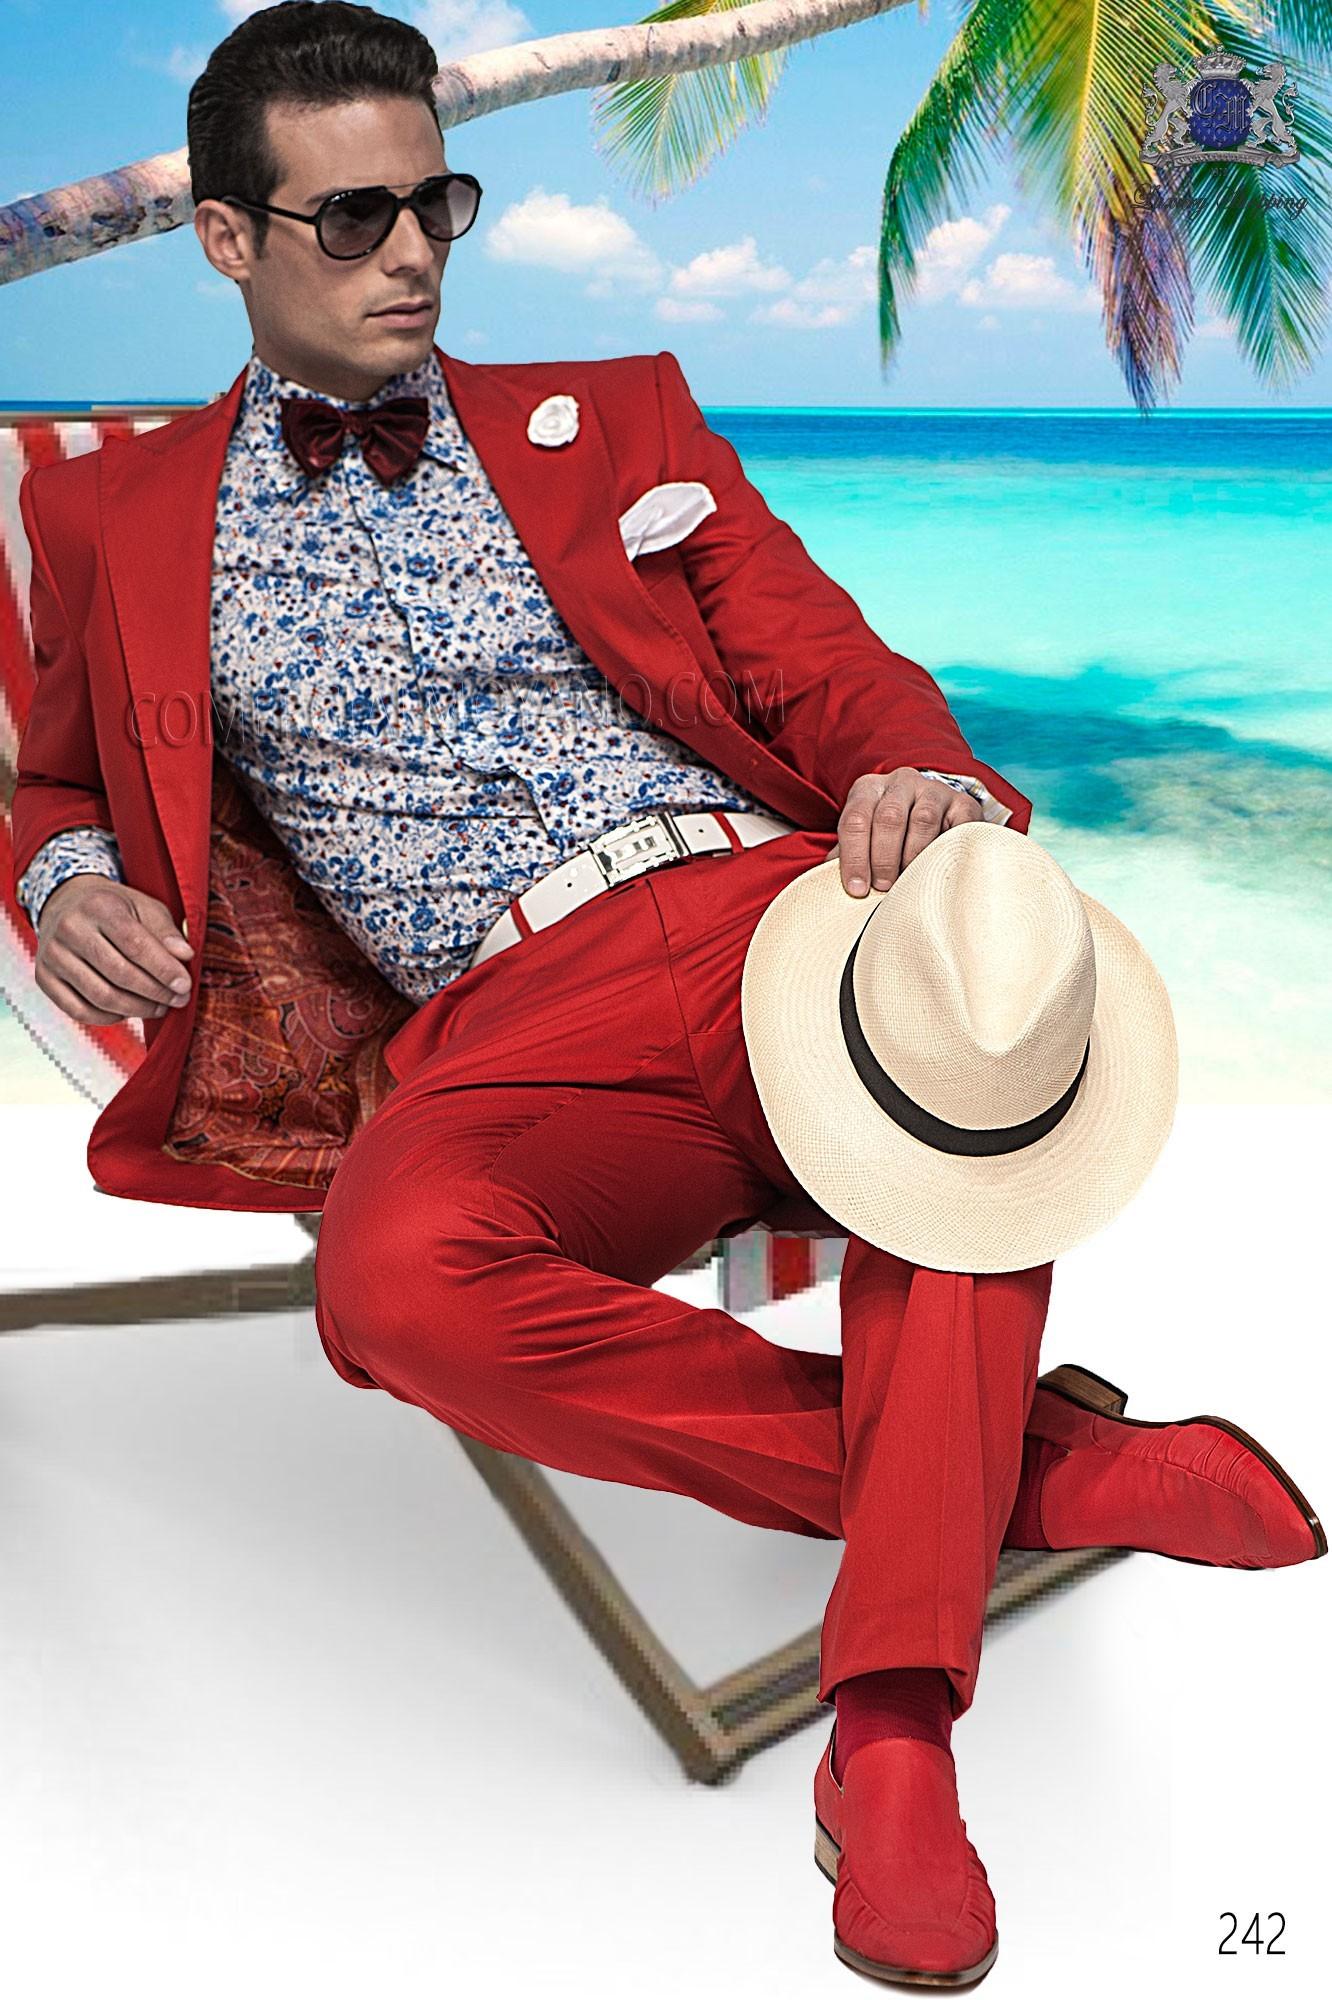 Traje de novio Hipster rojo modelo: 242 Ottavio Nuccio Gala colección Hipster